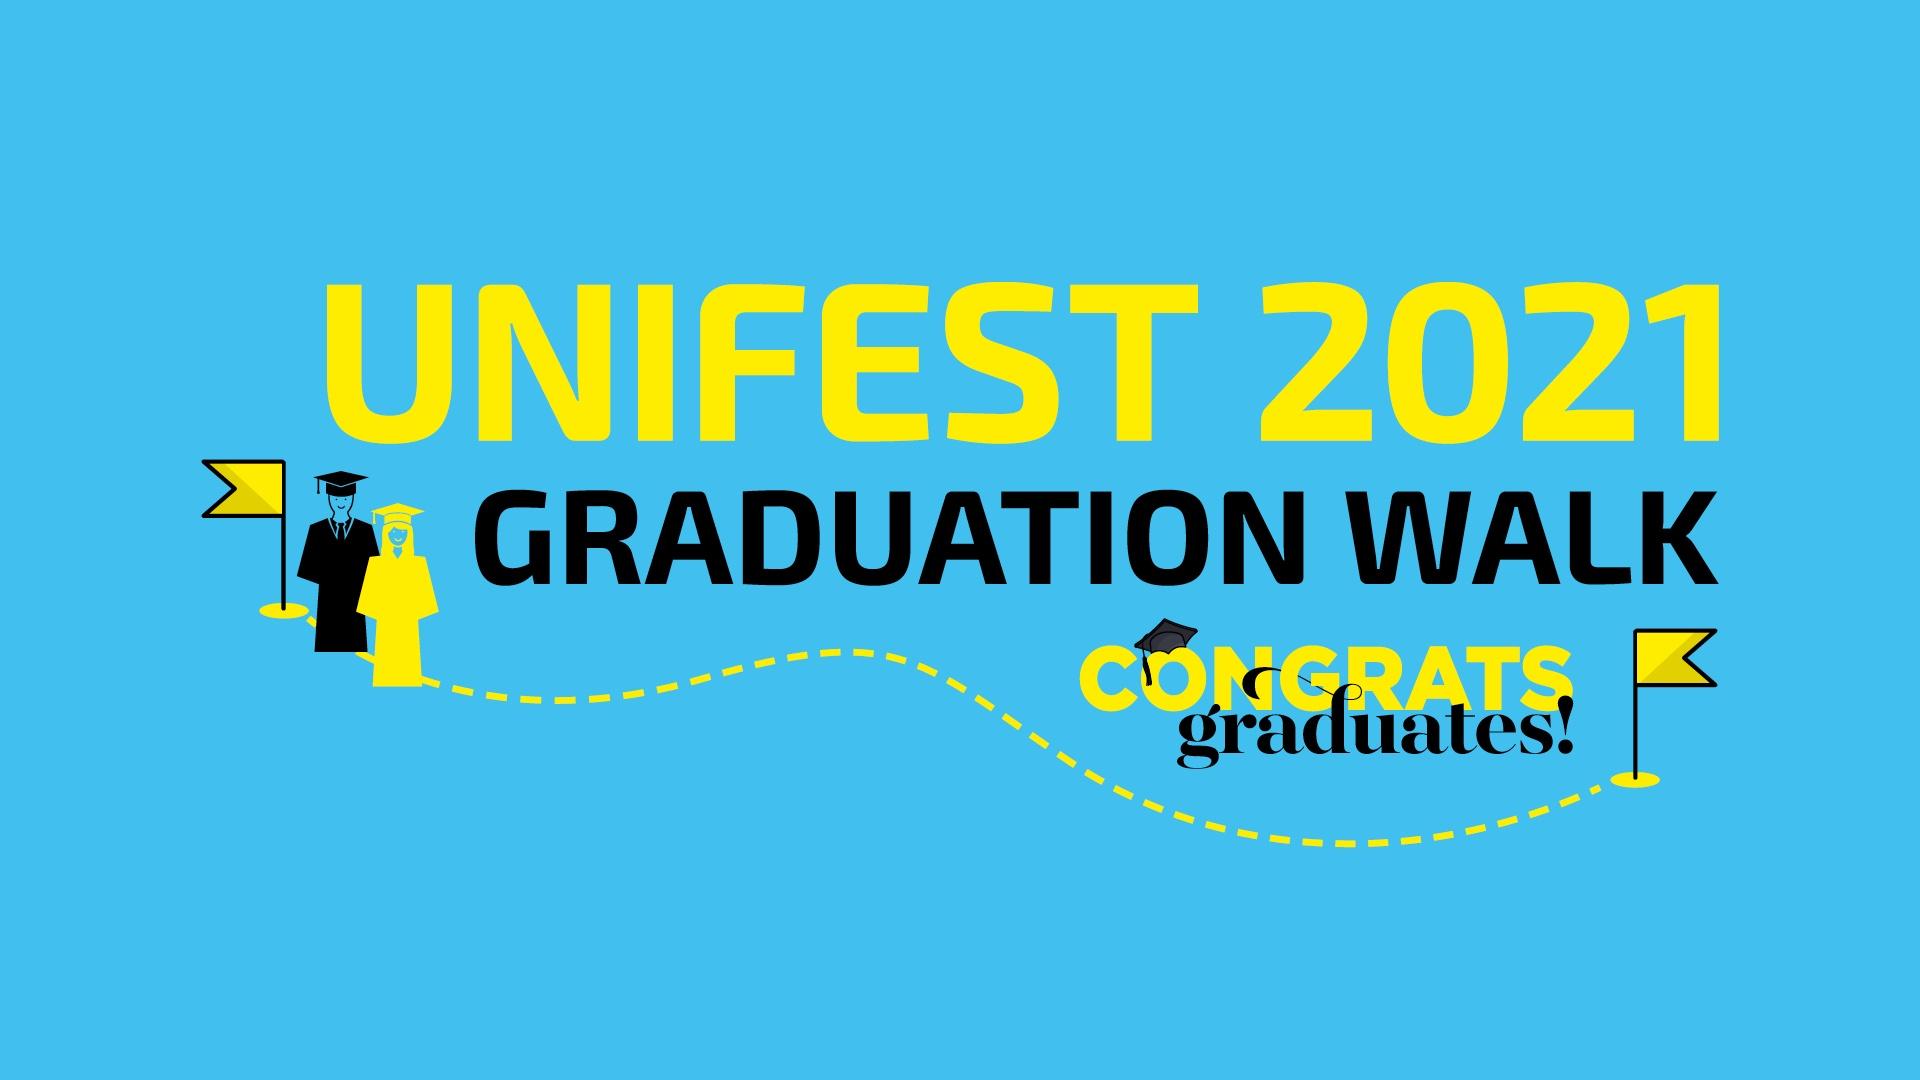 Digital Unifest 2021